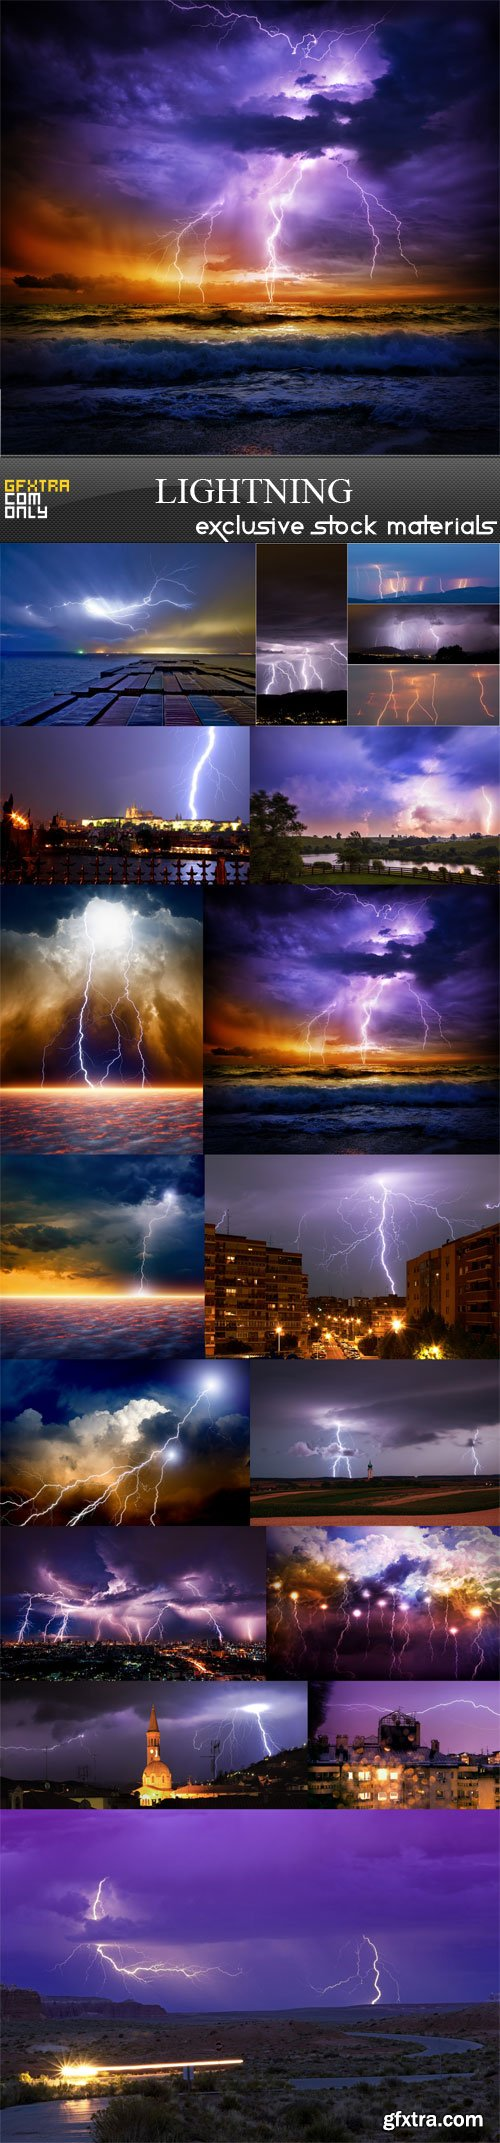 Lightning, 15 UHQ JPEG